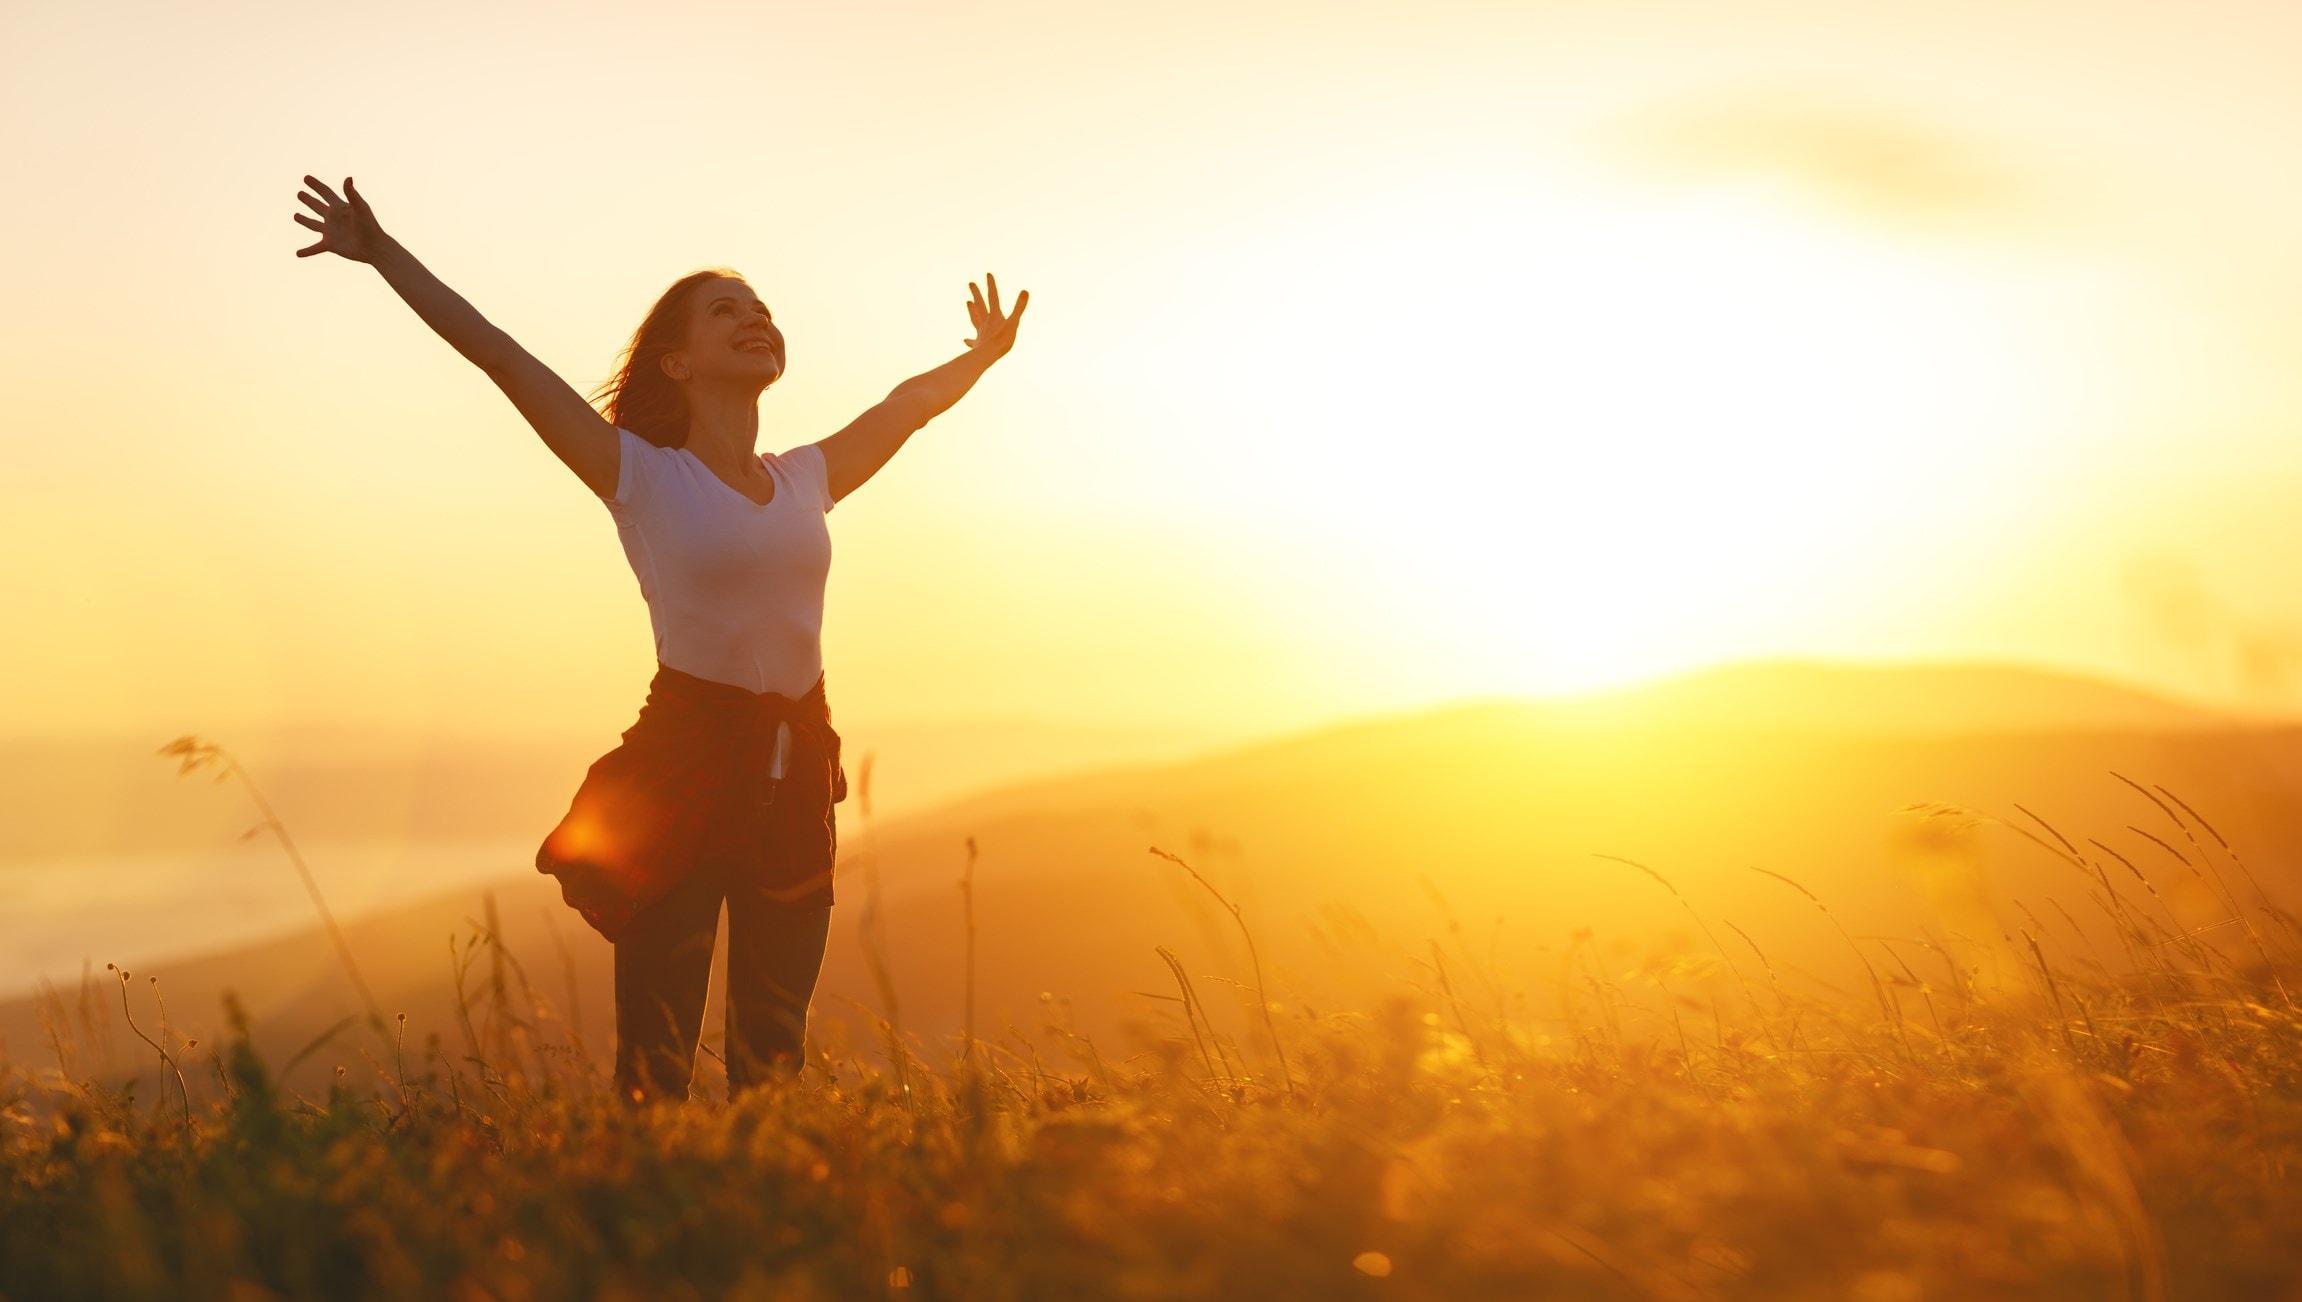 Lady absorbing sunshine